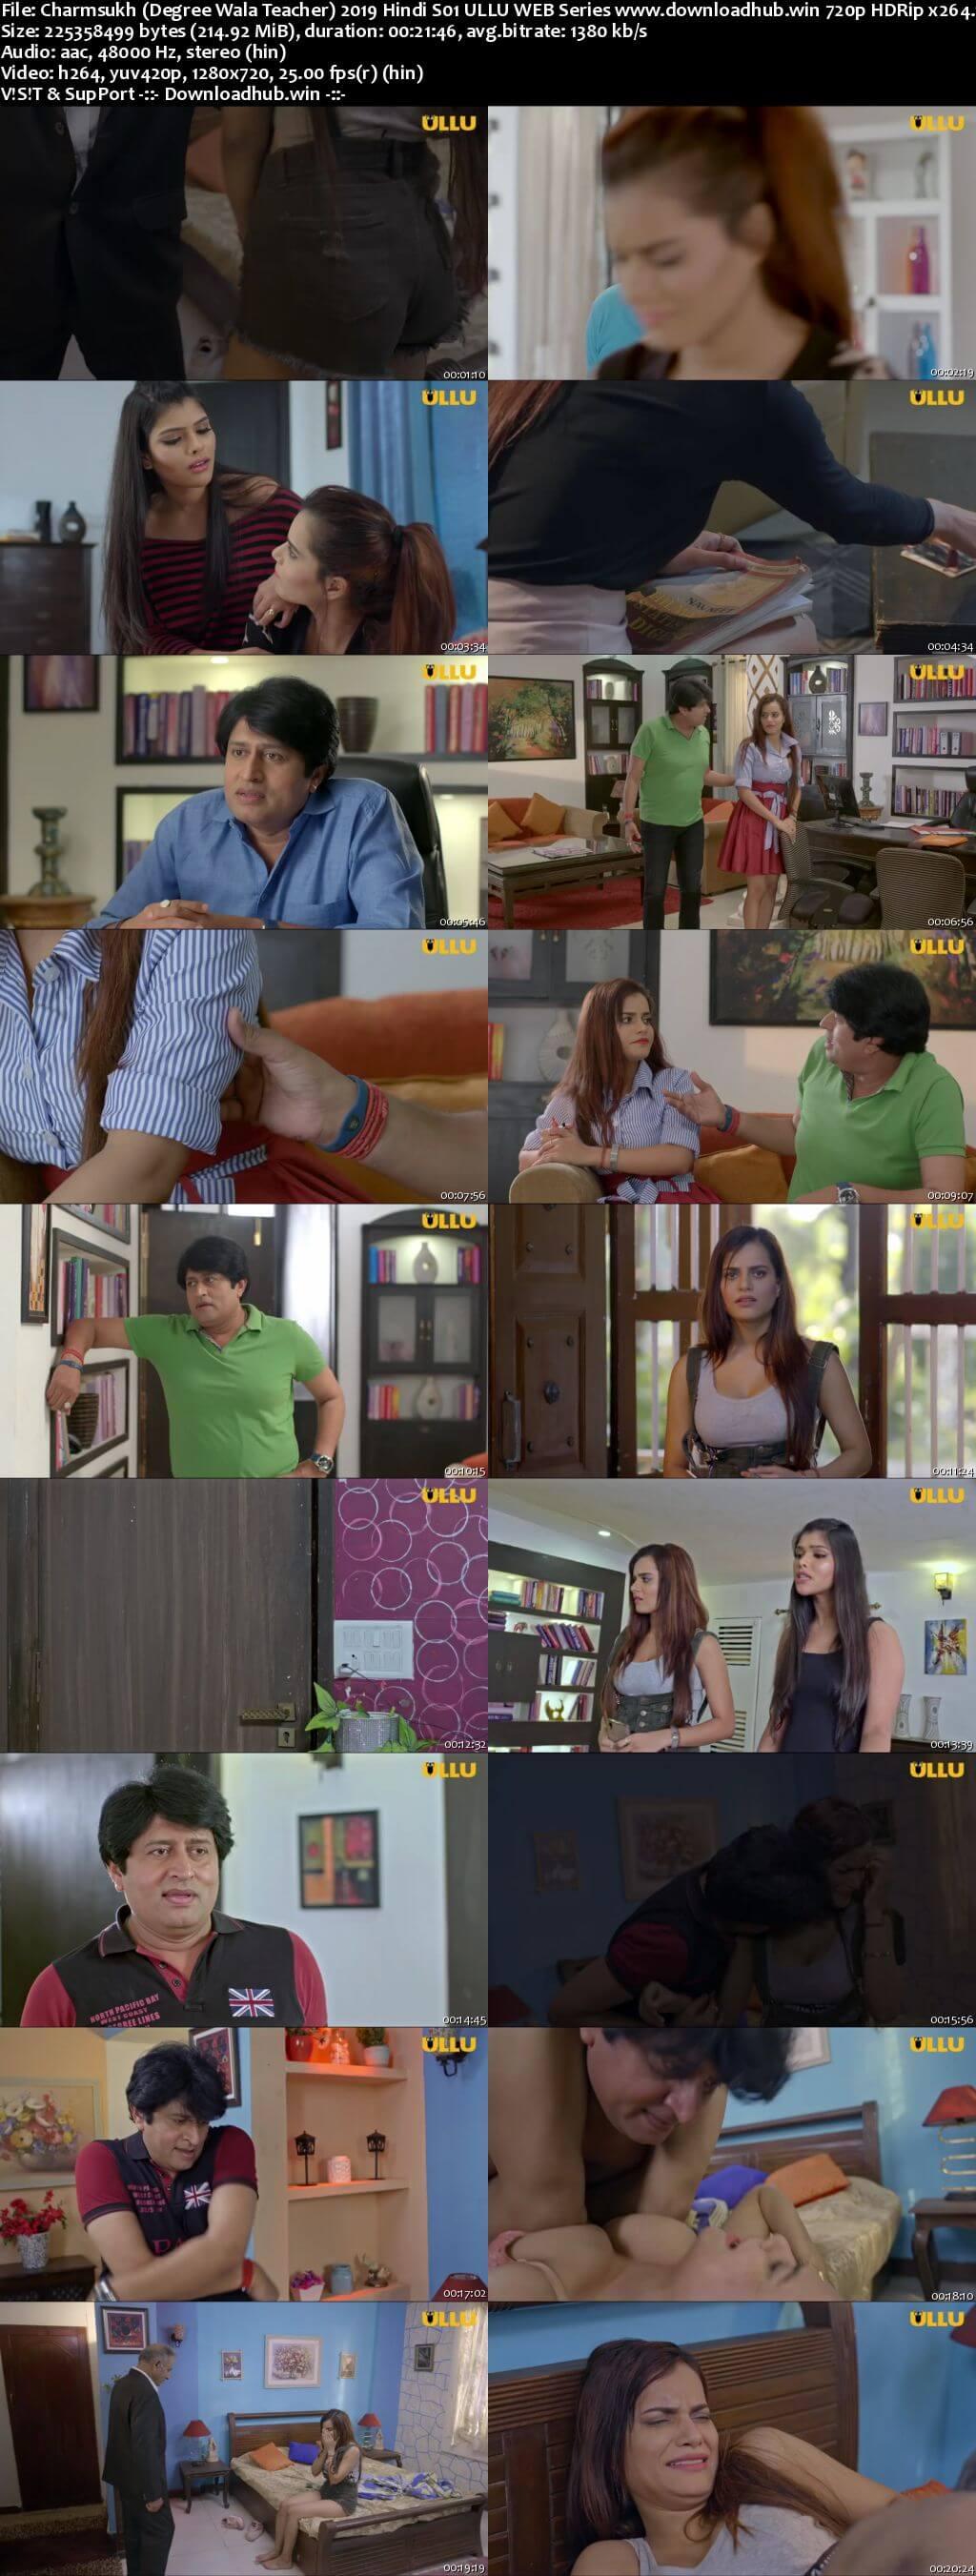 Charmsukh (Degree Wala Teacher) 2019 Hindi S01 ULLU WEB Series 720p HDRip x264